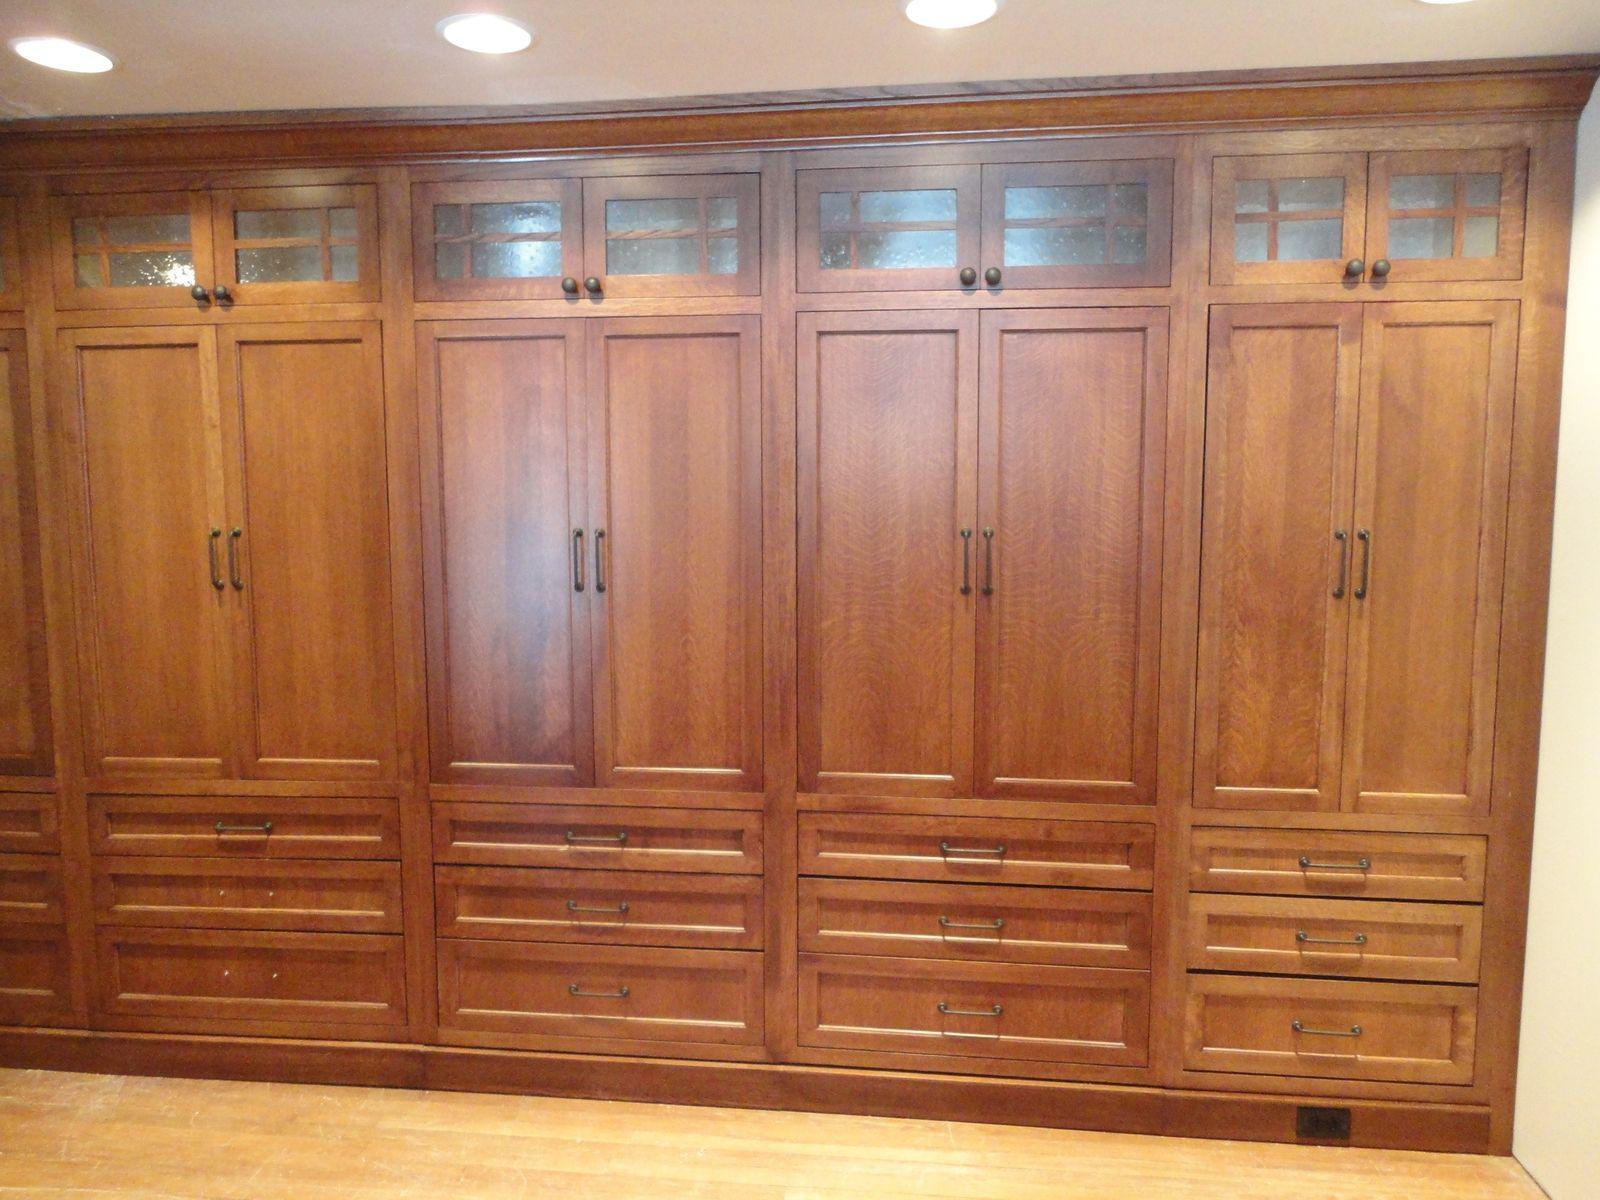 Classy Handmade Oak Built In Wardrobe Closet Unstained With 8 Door Cabinet  Also Hidden Drawer Storage. Classy Handmade Oak Built In Wardrobe Closet Unstained With 8 Door